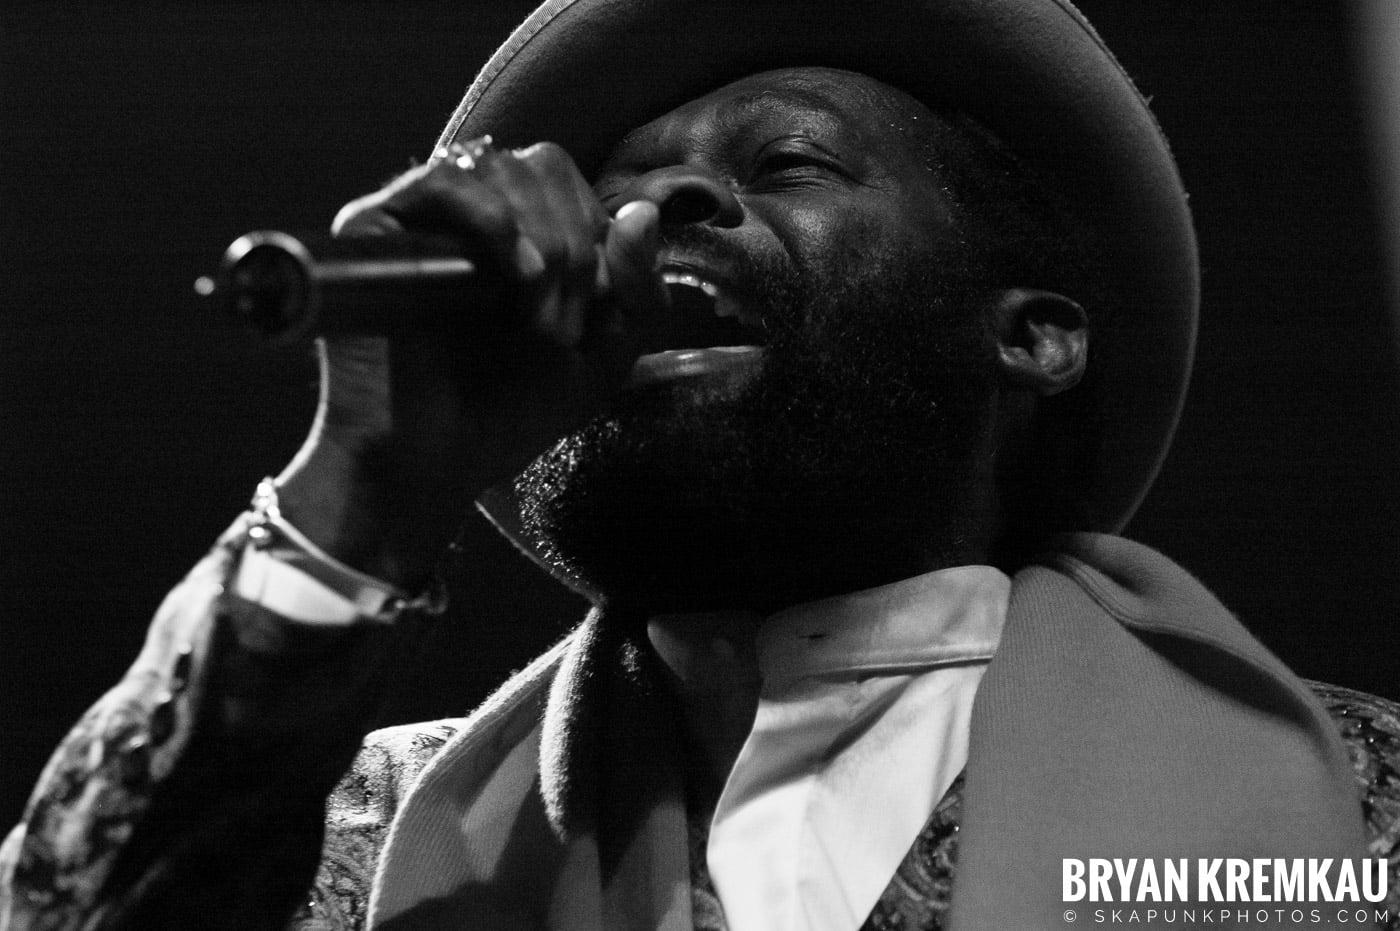 Jimmy Riley @ Vintage Reggae Fest - Hammerstein Ballroom, NYC - 12.16.07 (4)